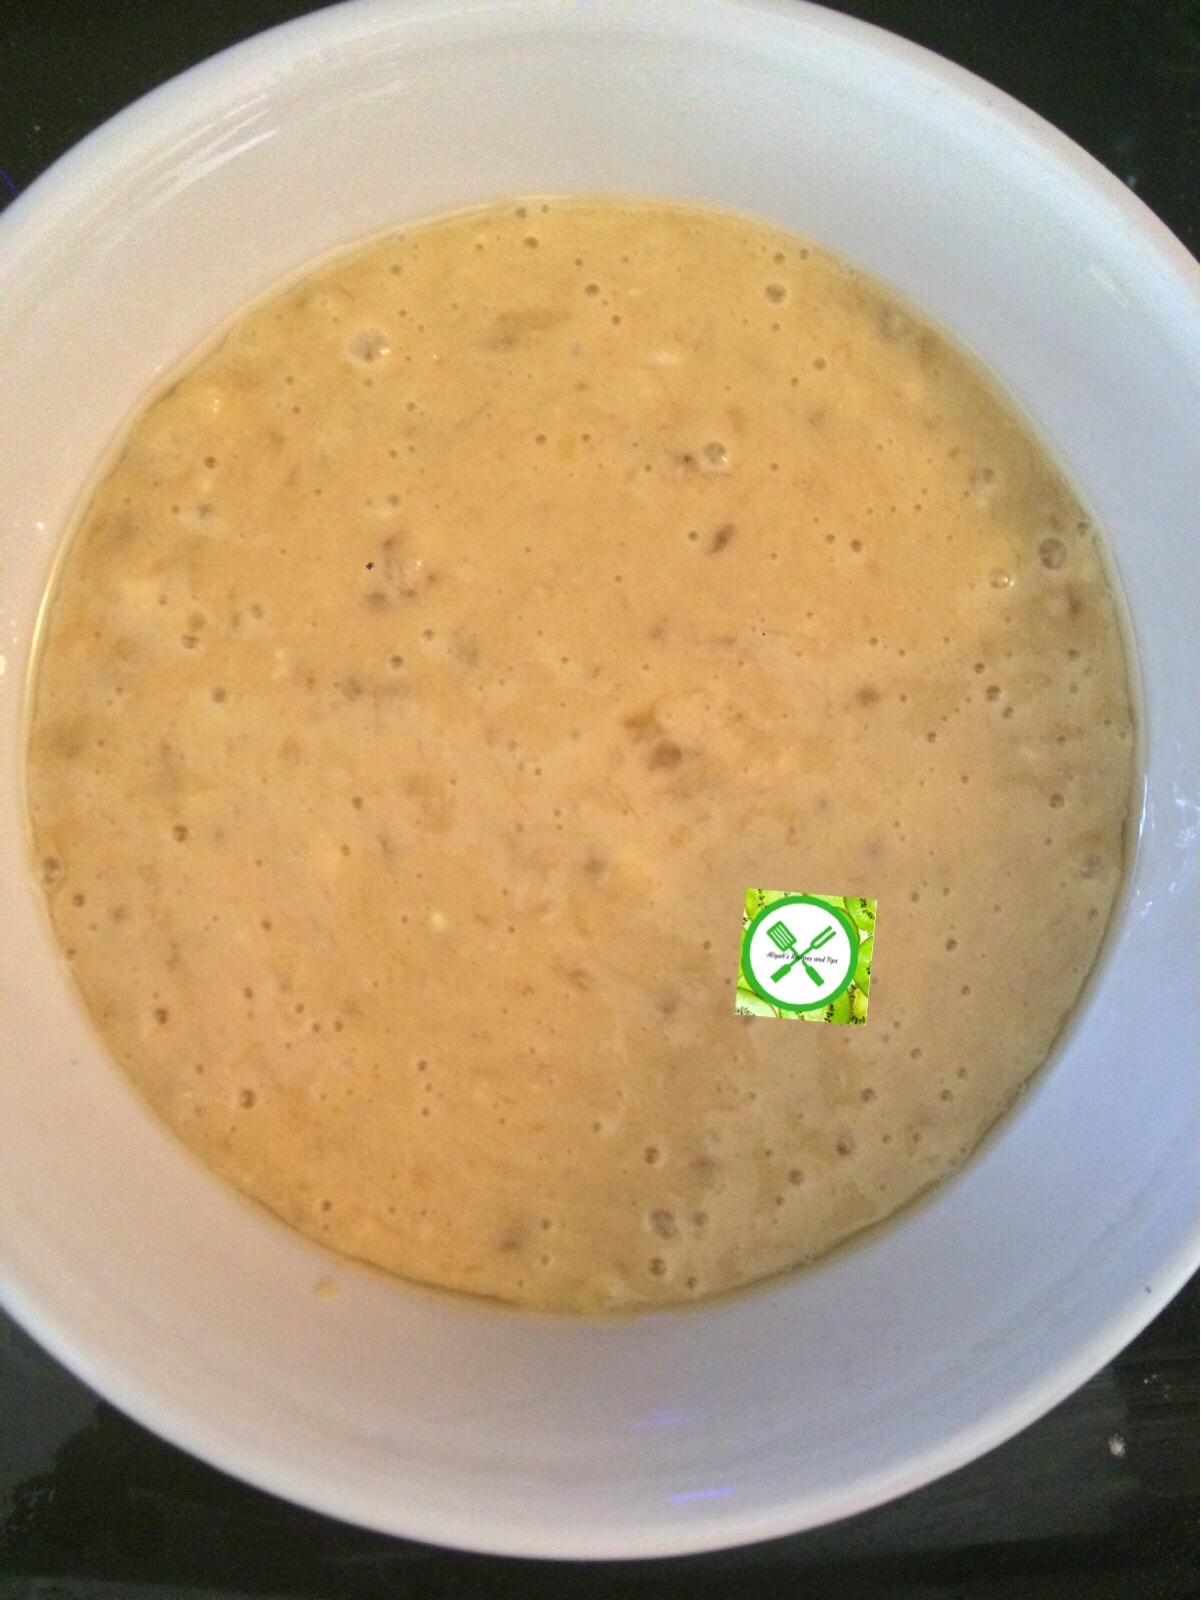 Banana Mug Cake mixture